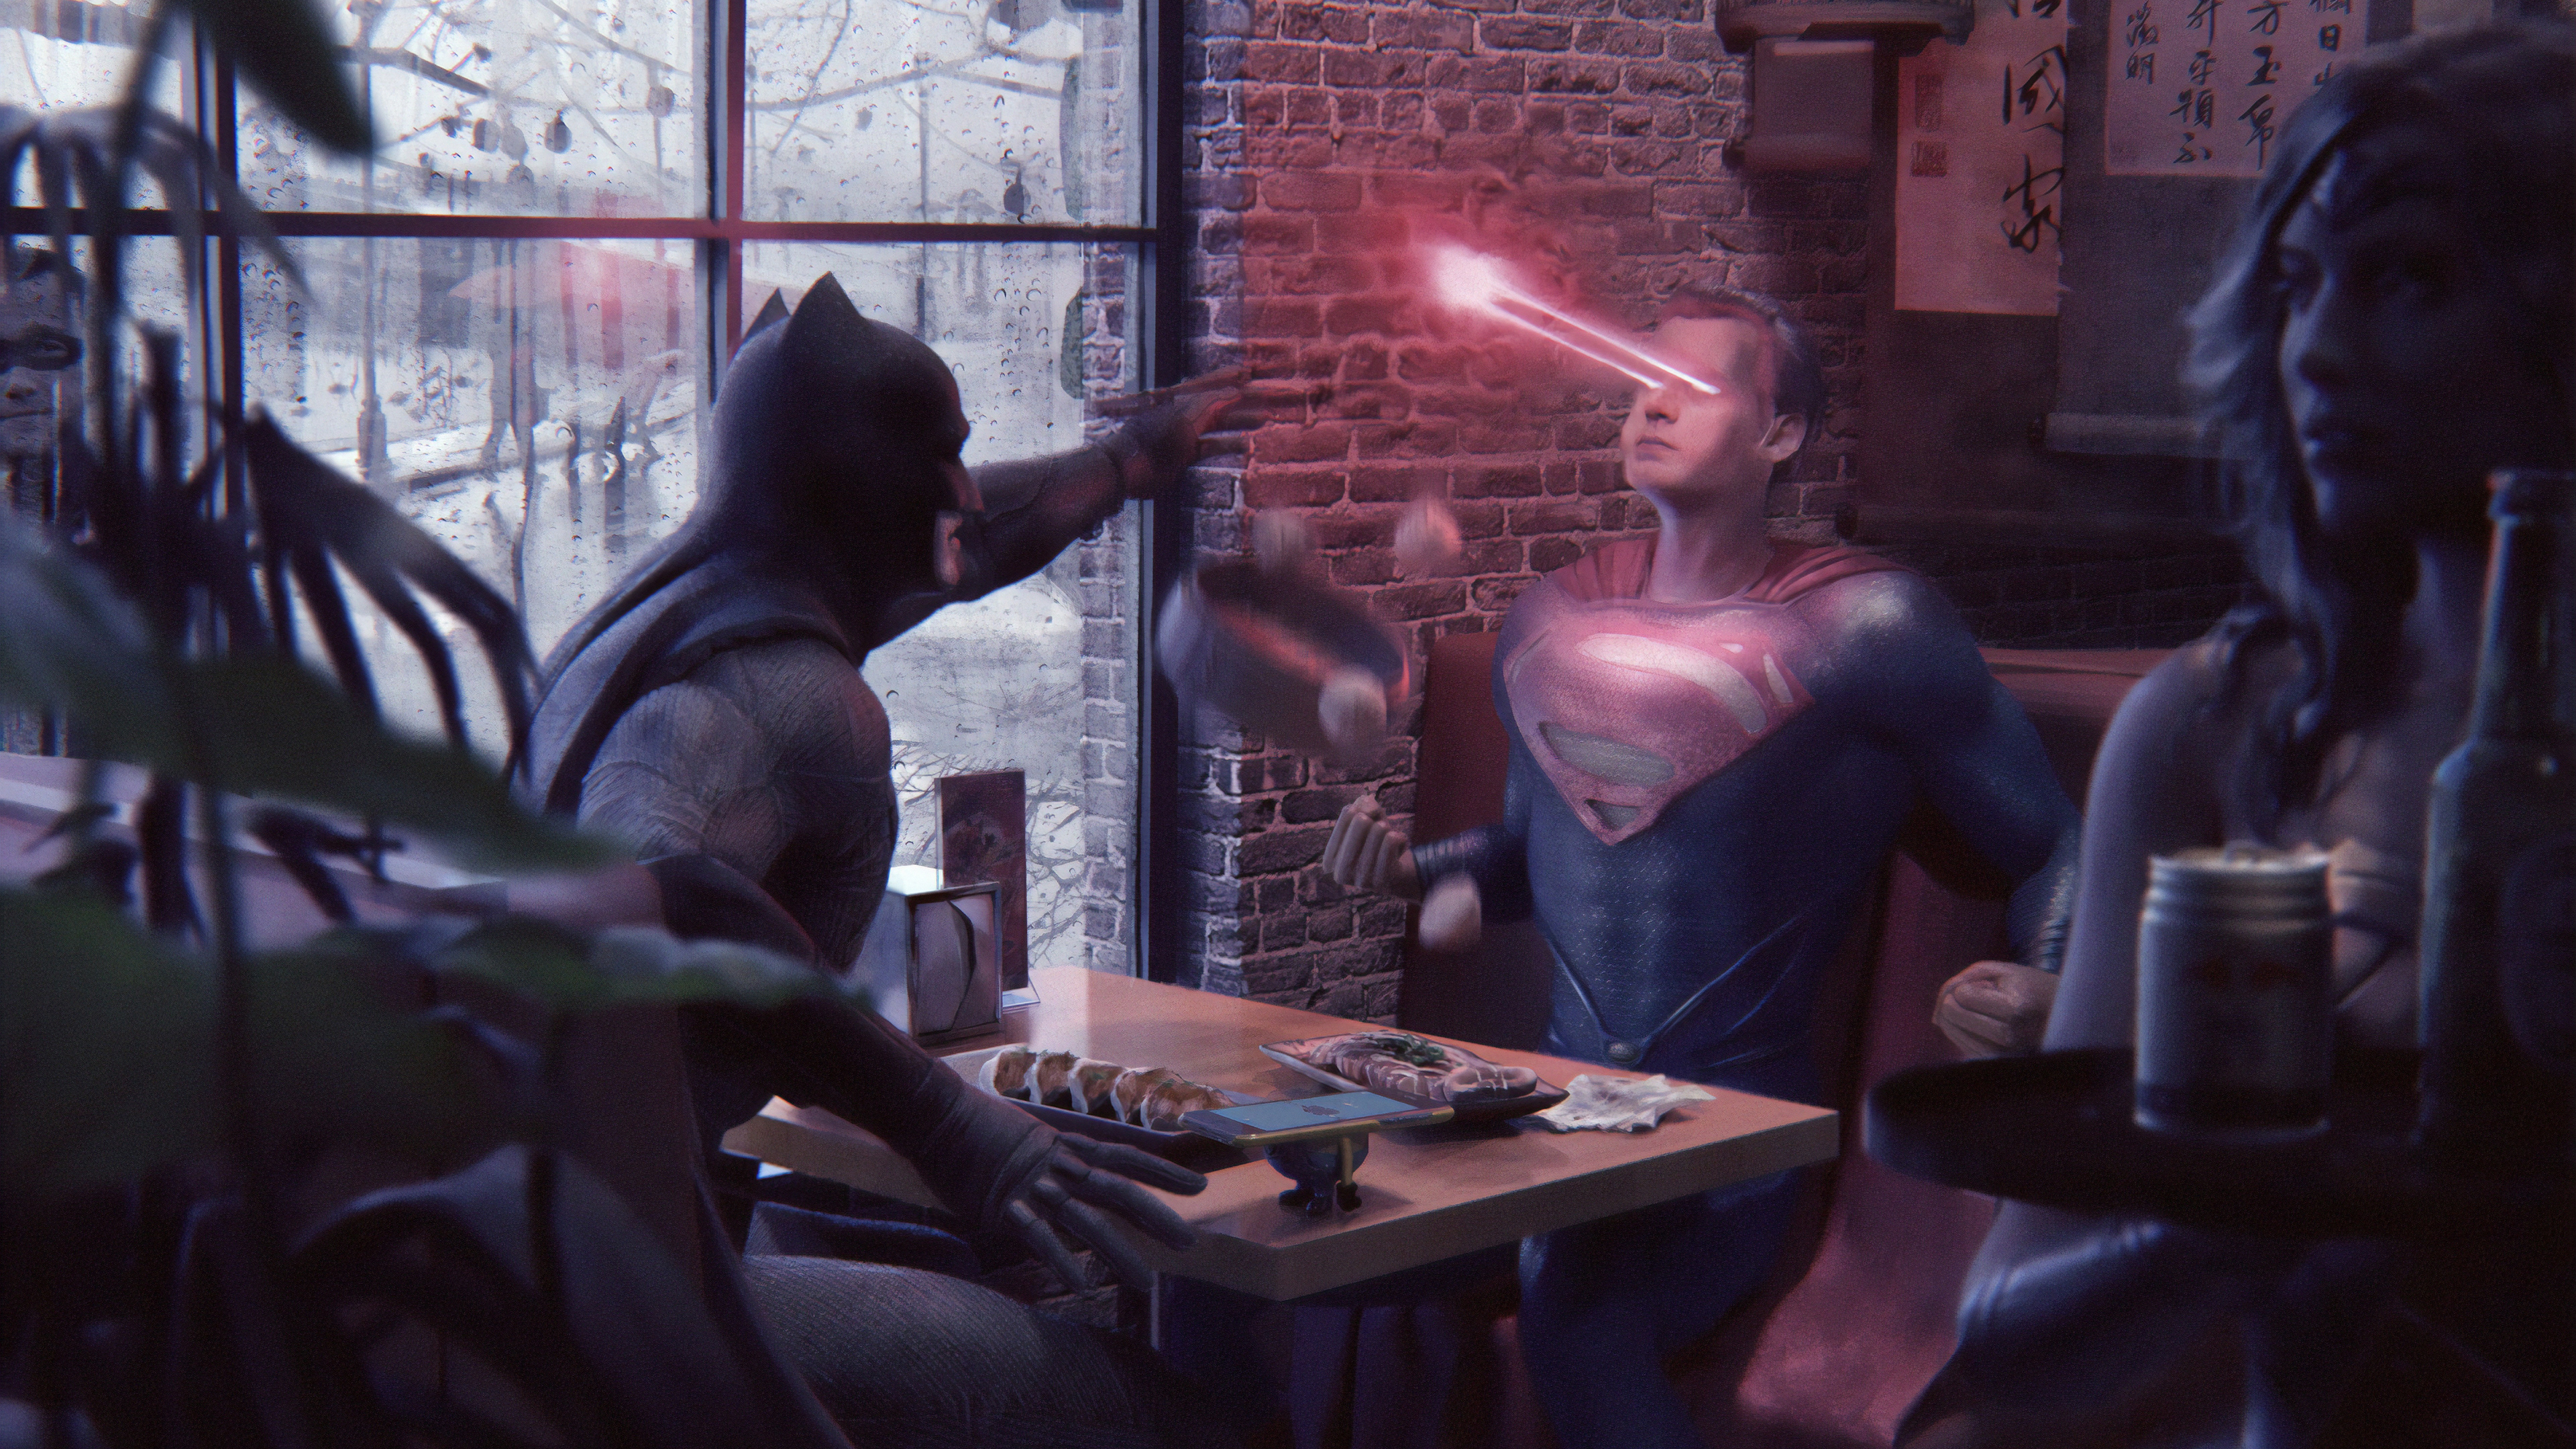 batman superman laser eye 1572368667 - Batman Superman Laser Eye - superman wallpapers, superheroes wallpapers, hd-wallpapers, digital art wallpapers, batman wallpapers, artwork wallpapers, 4k-wallpapers